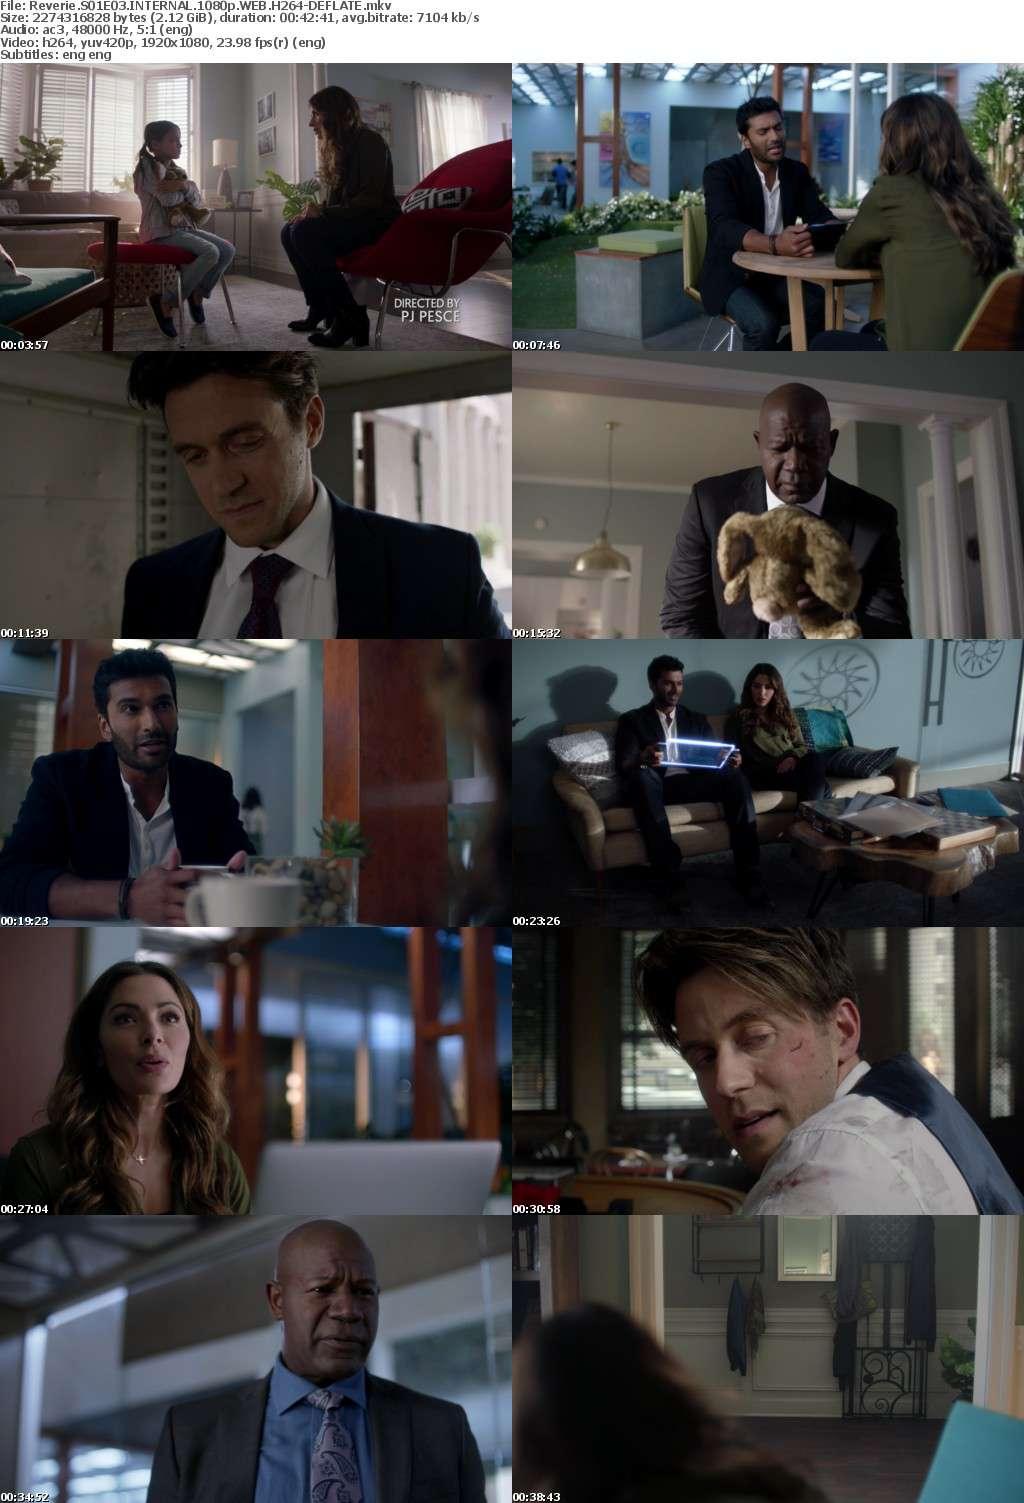 Reverie S01E03 INTERNAL 1080p WEB H264-DEFLATE